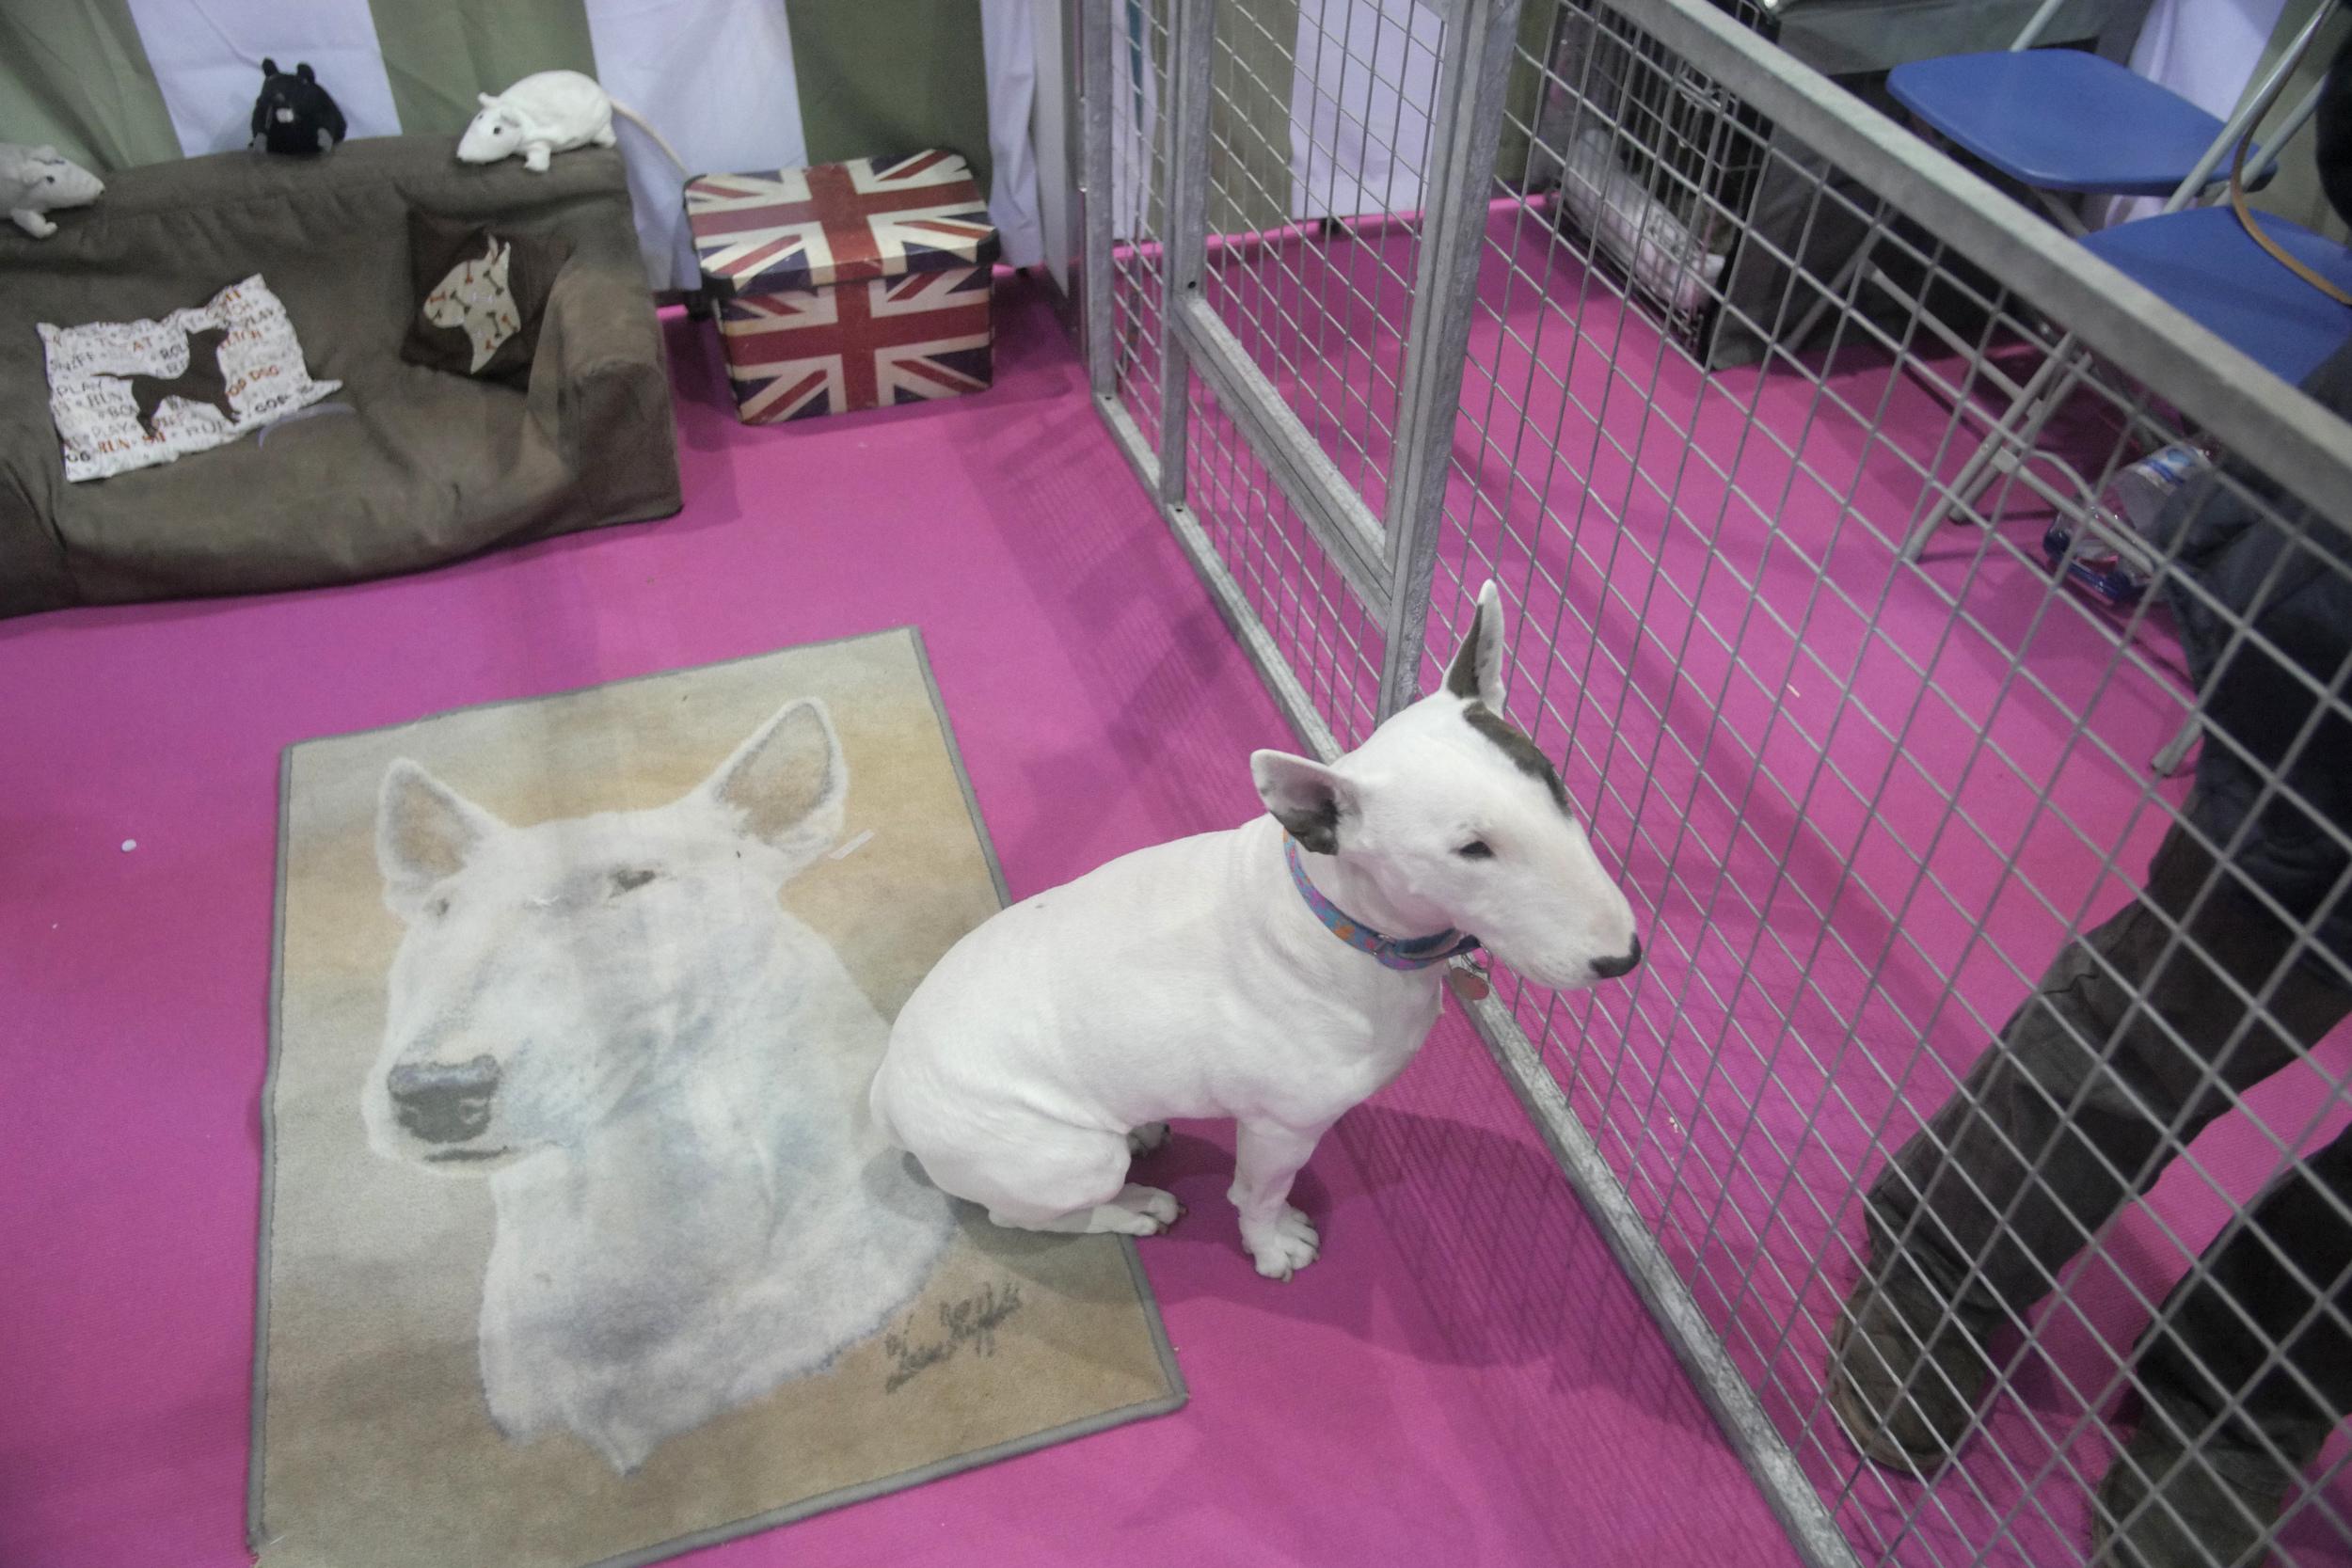 Miniature bull terrier & carpet